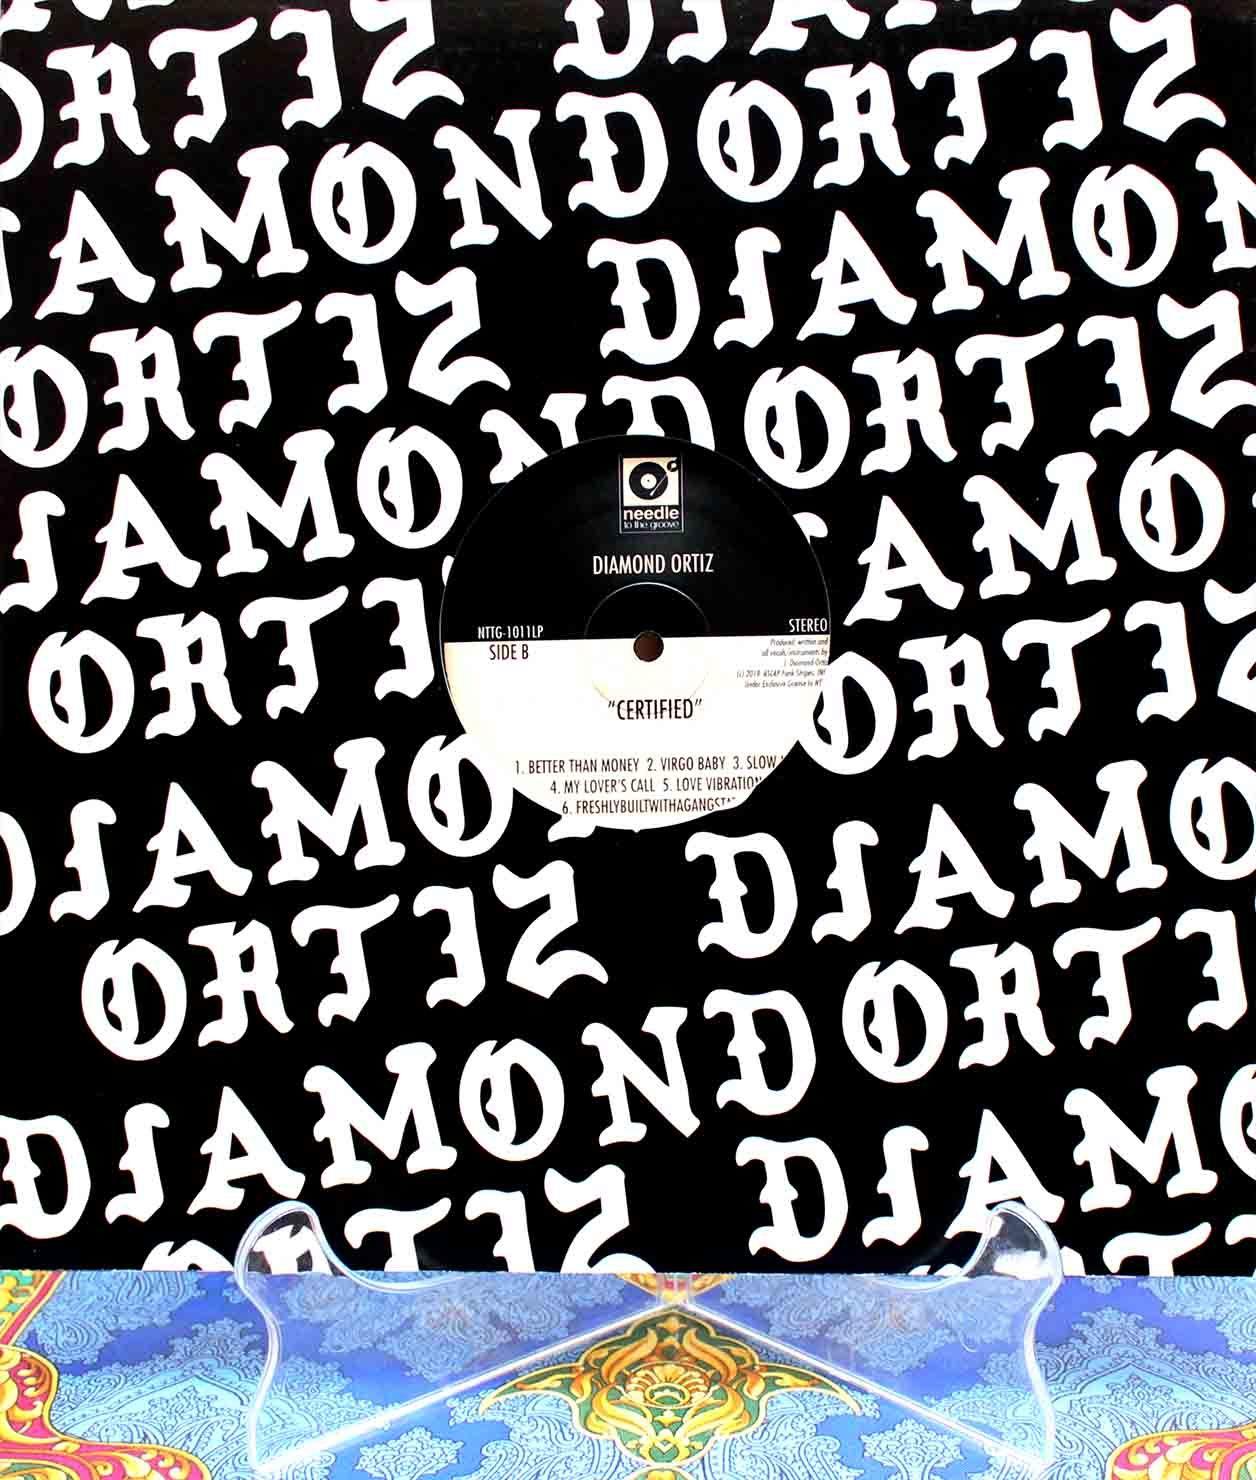 Diamond Ortiz – Certified 02